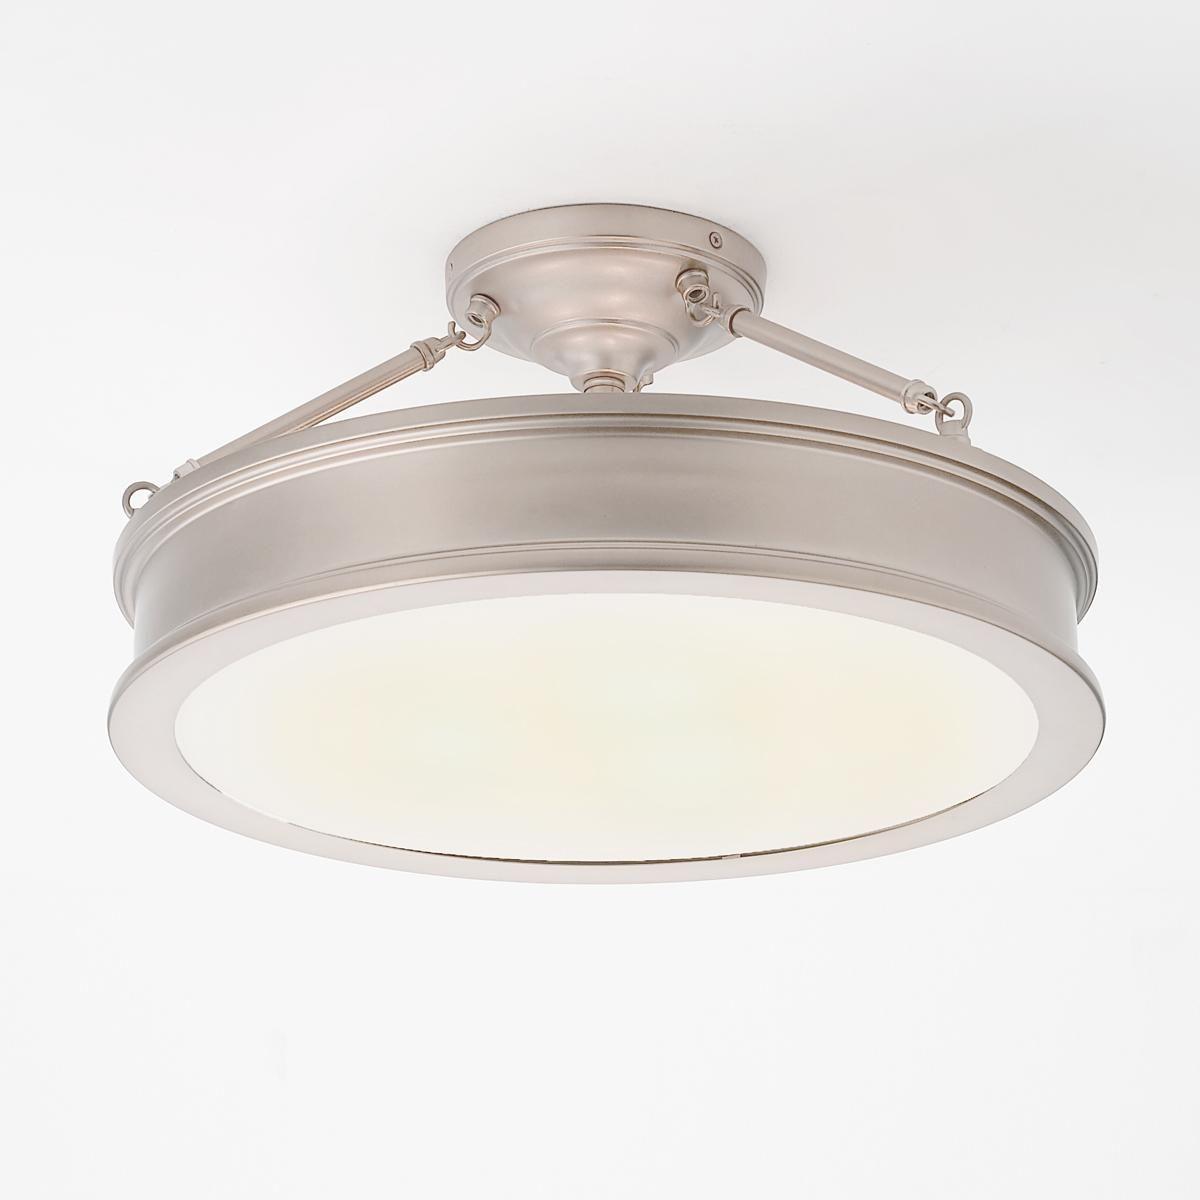 Traditional Urban Semi Flush Ceiling Light In 2020 Semi Flush